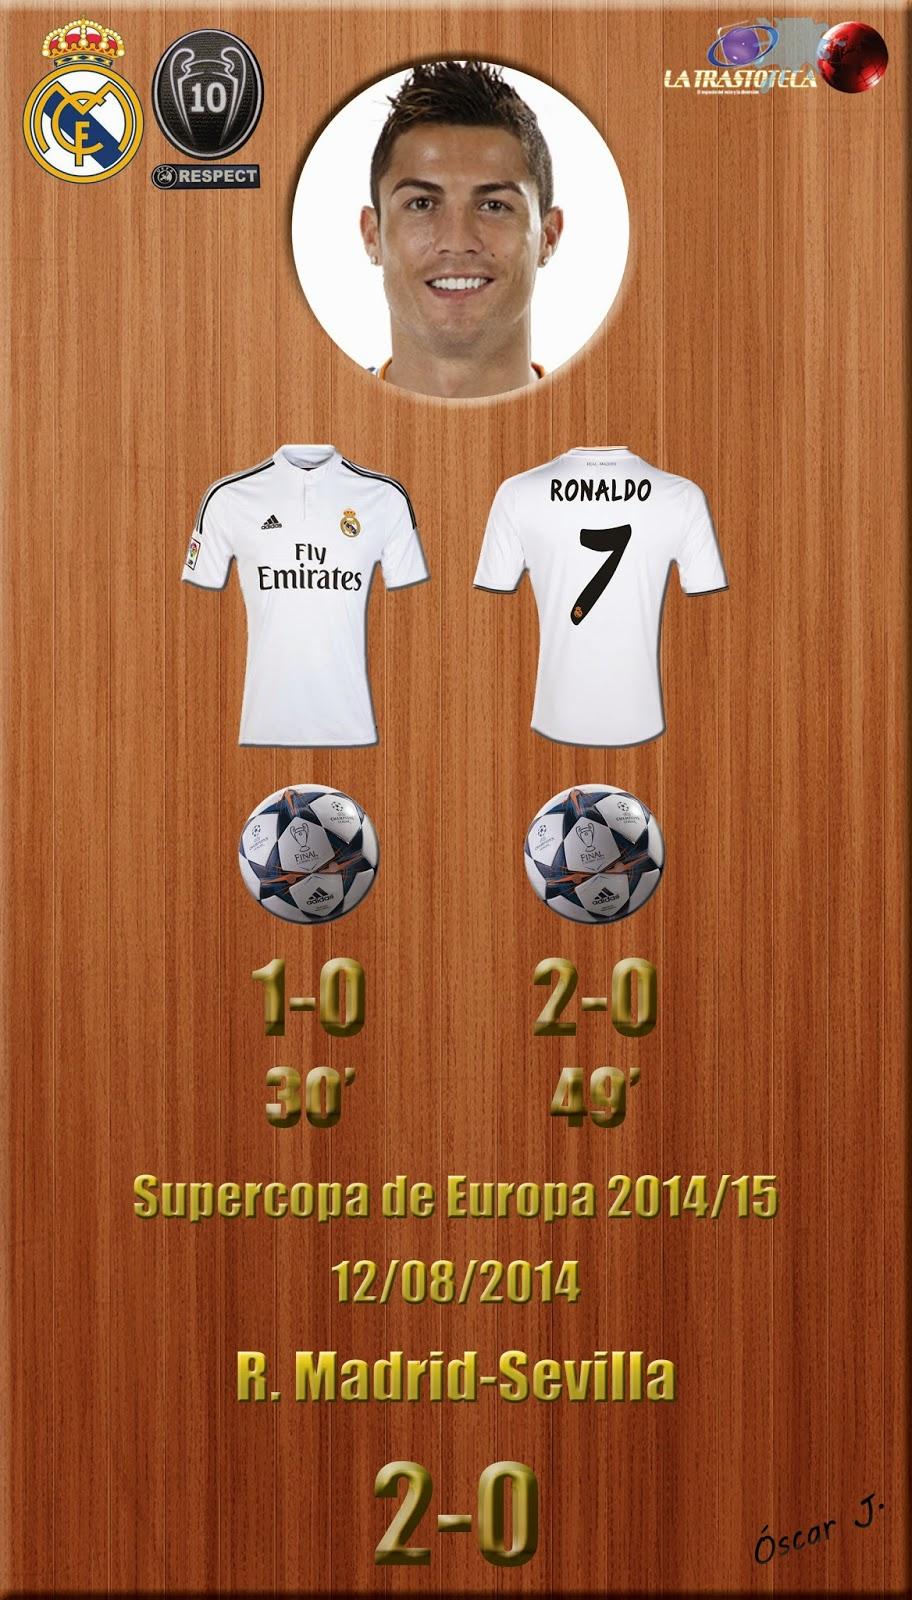 Cristiano Ronaldo (1-0) y (2-0) - Supercopa de Europa 2014/15